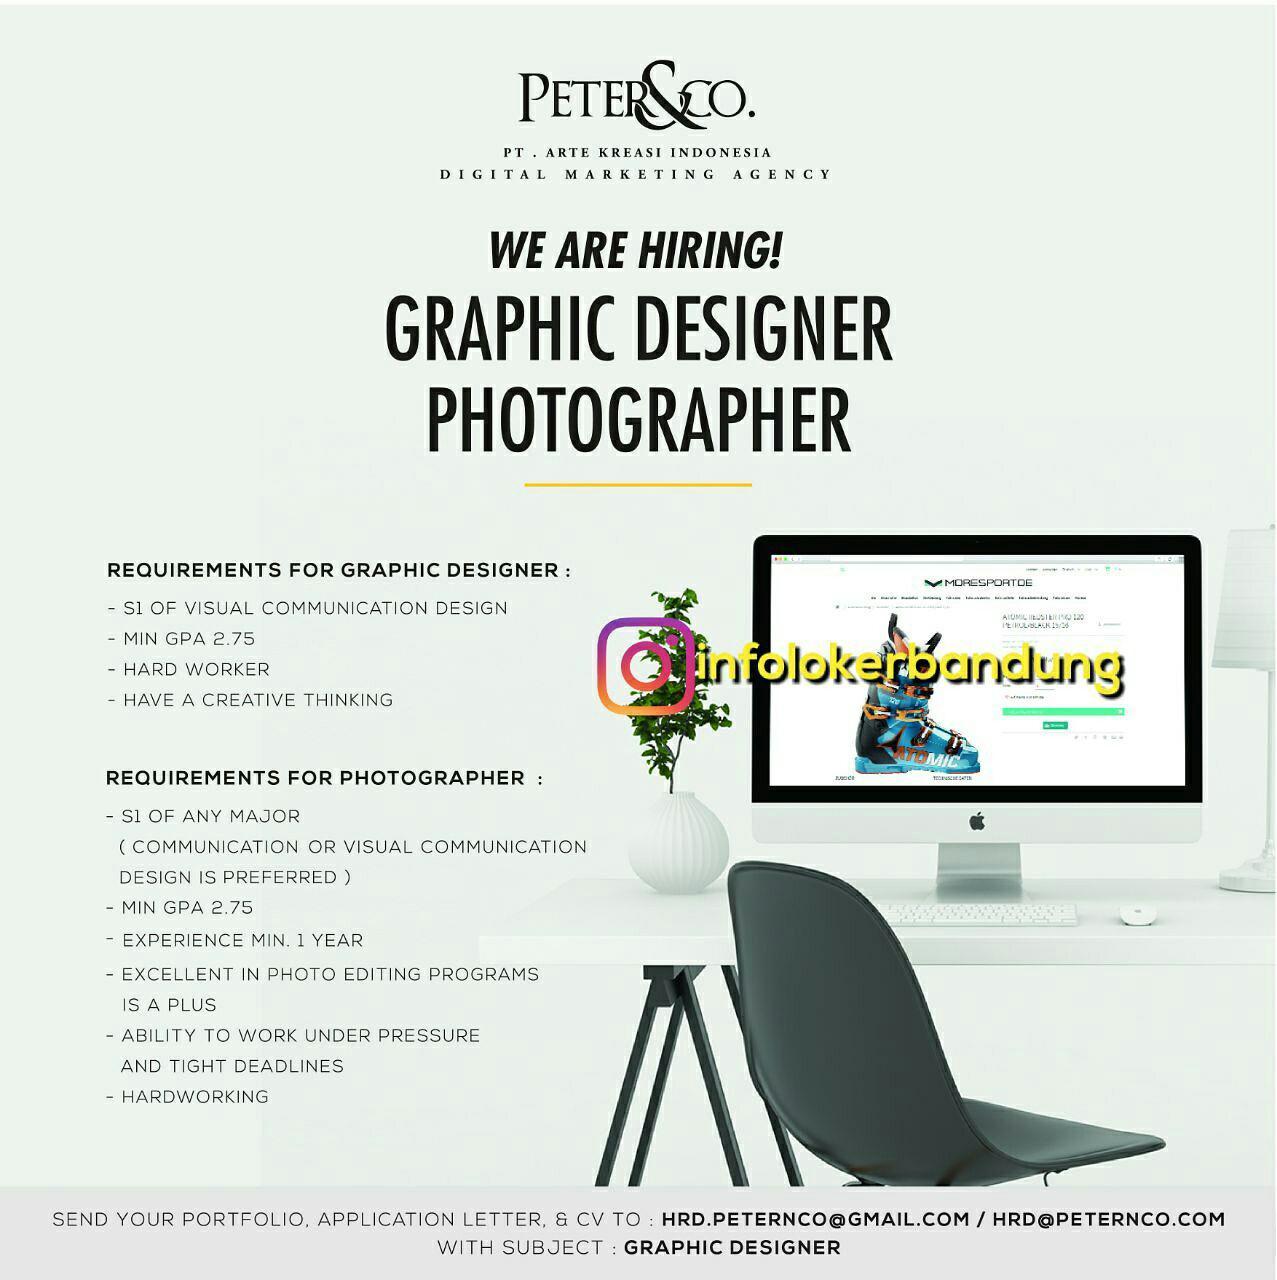 Lowongan Kerja Graphic Deigner & Photographer PT. Arte Kreasi Indoensia ( Peter&Co) September 2017